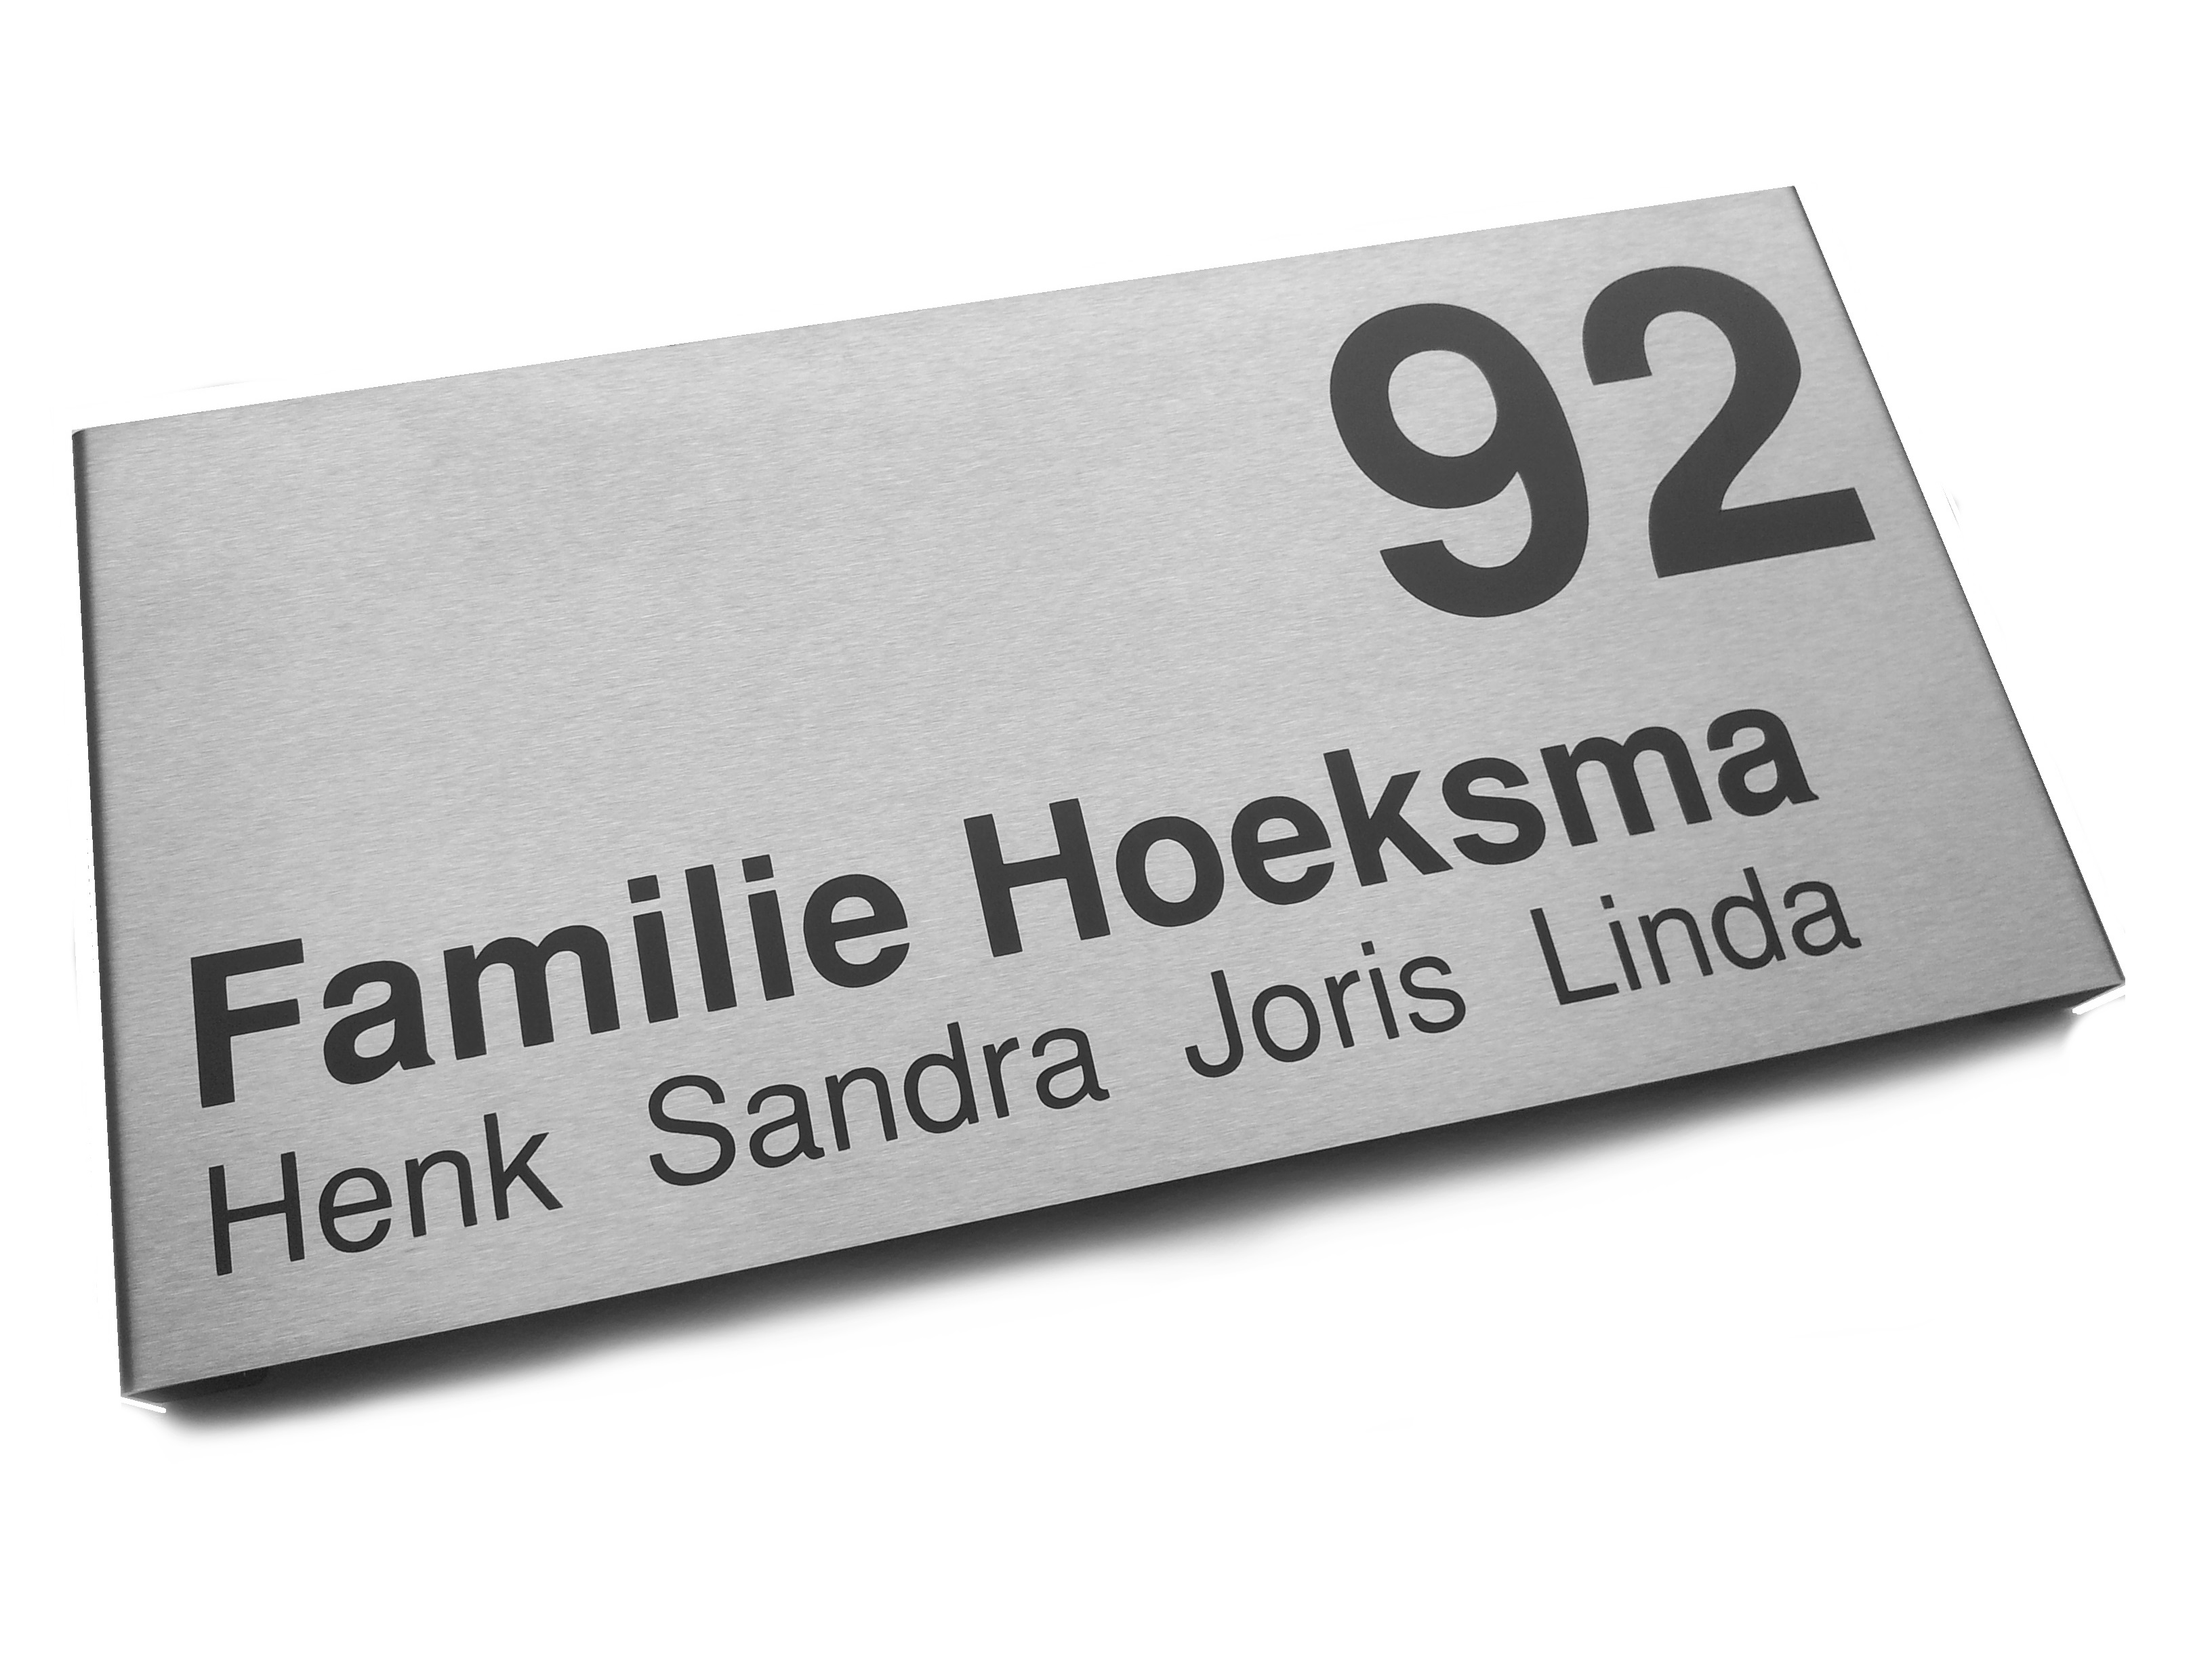 naambord voordeur vlak model